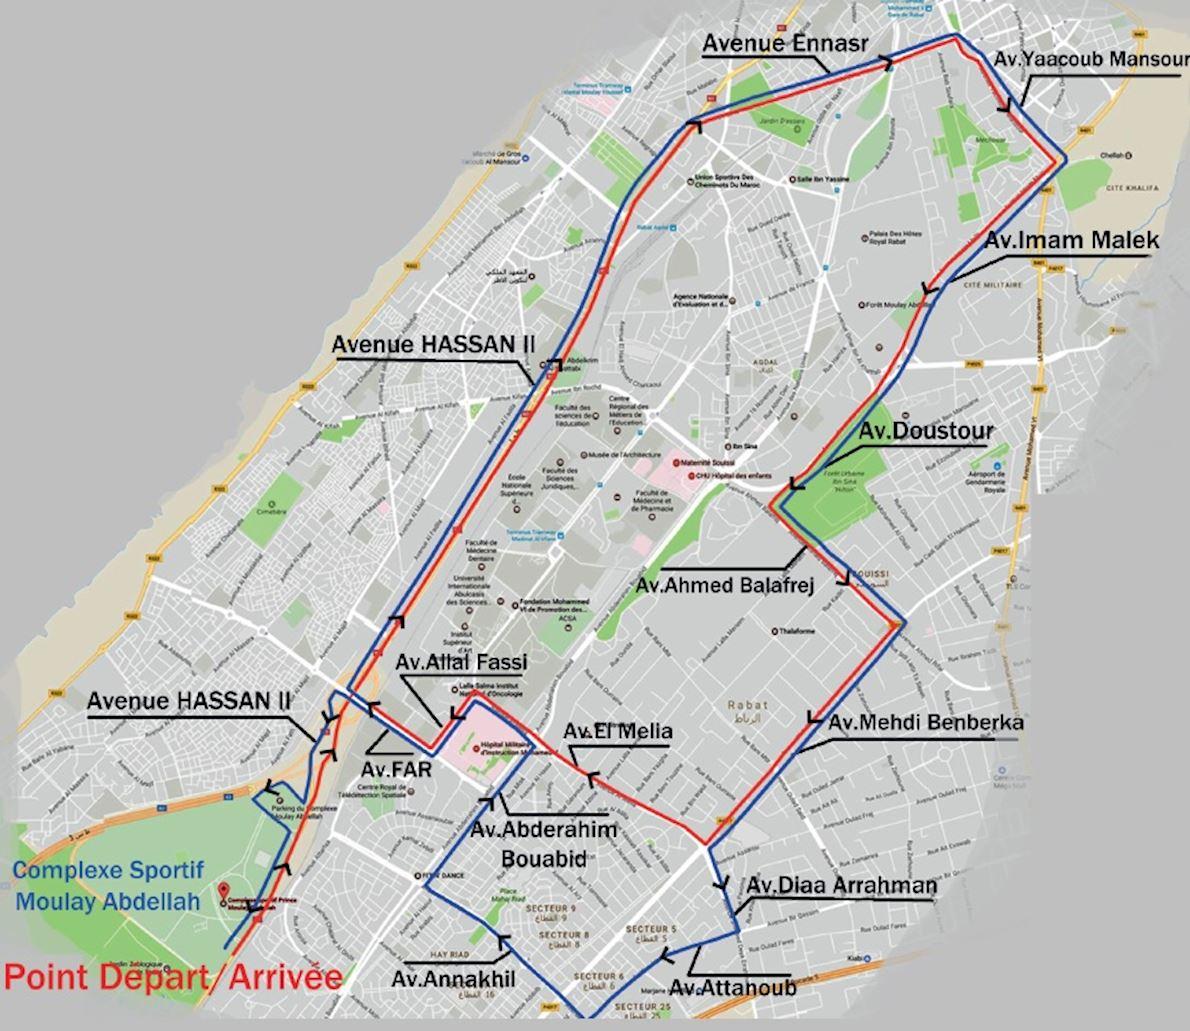 International Marathon of Rabat MAPA DEL RECORRIDO DE